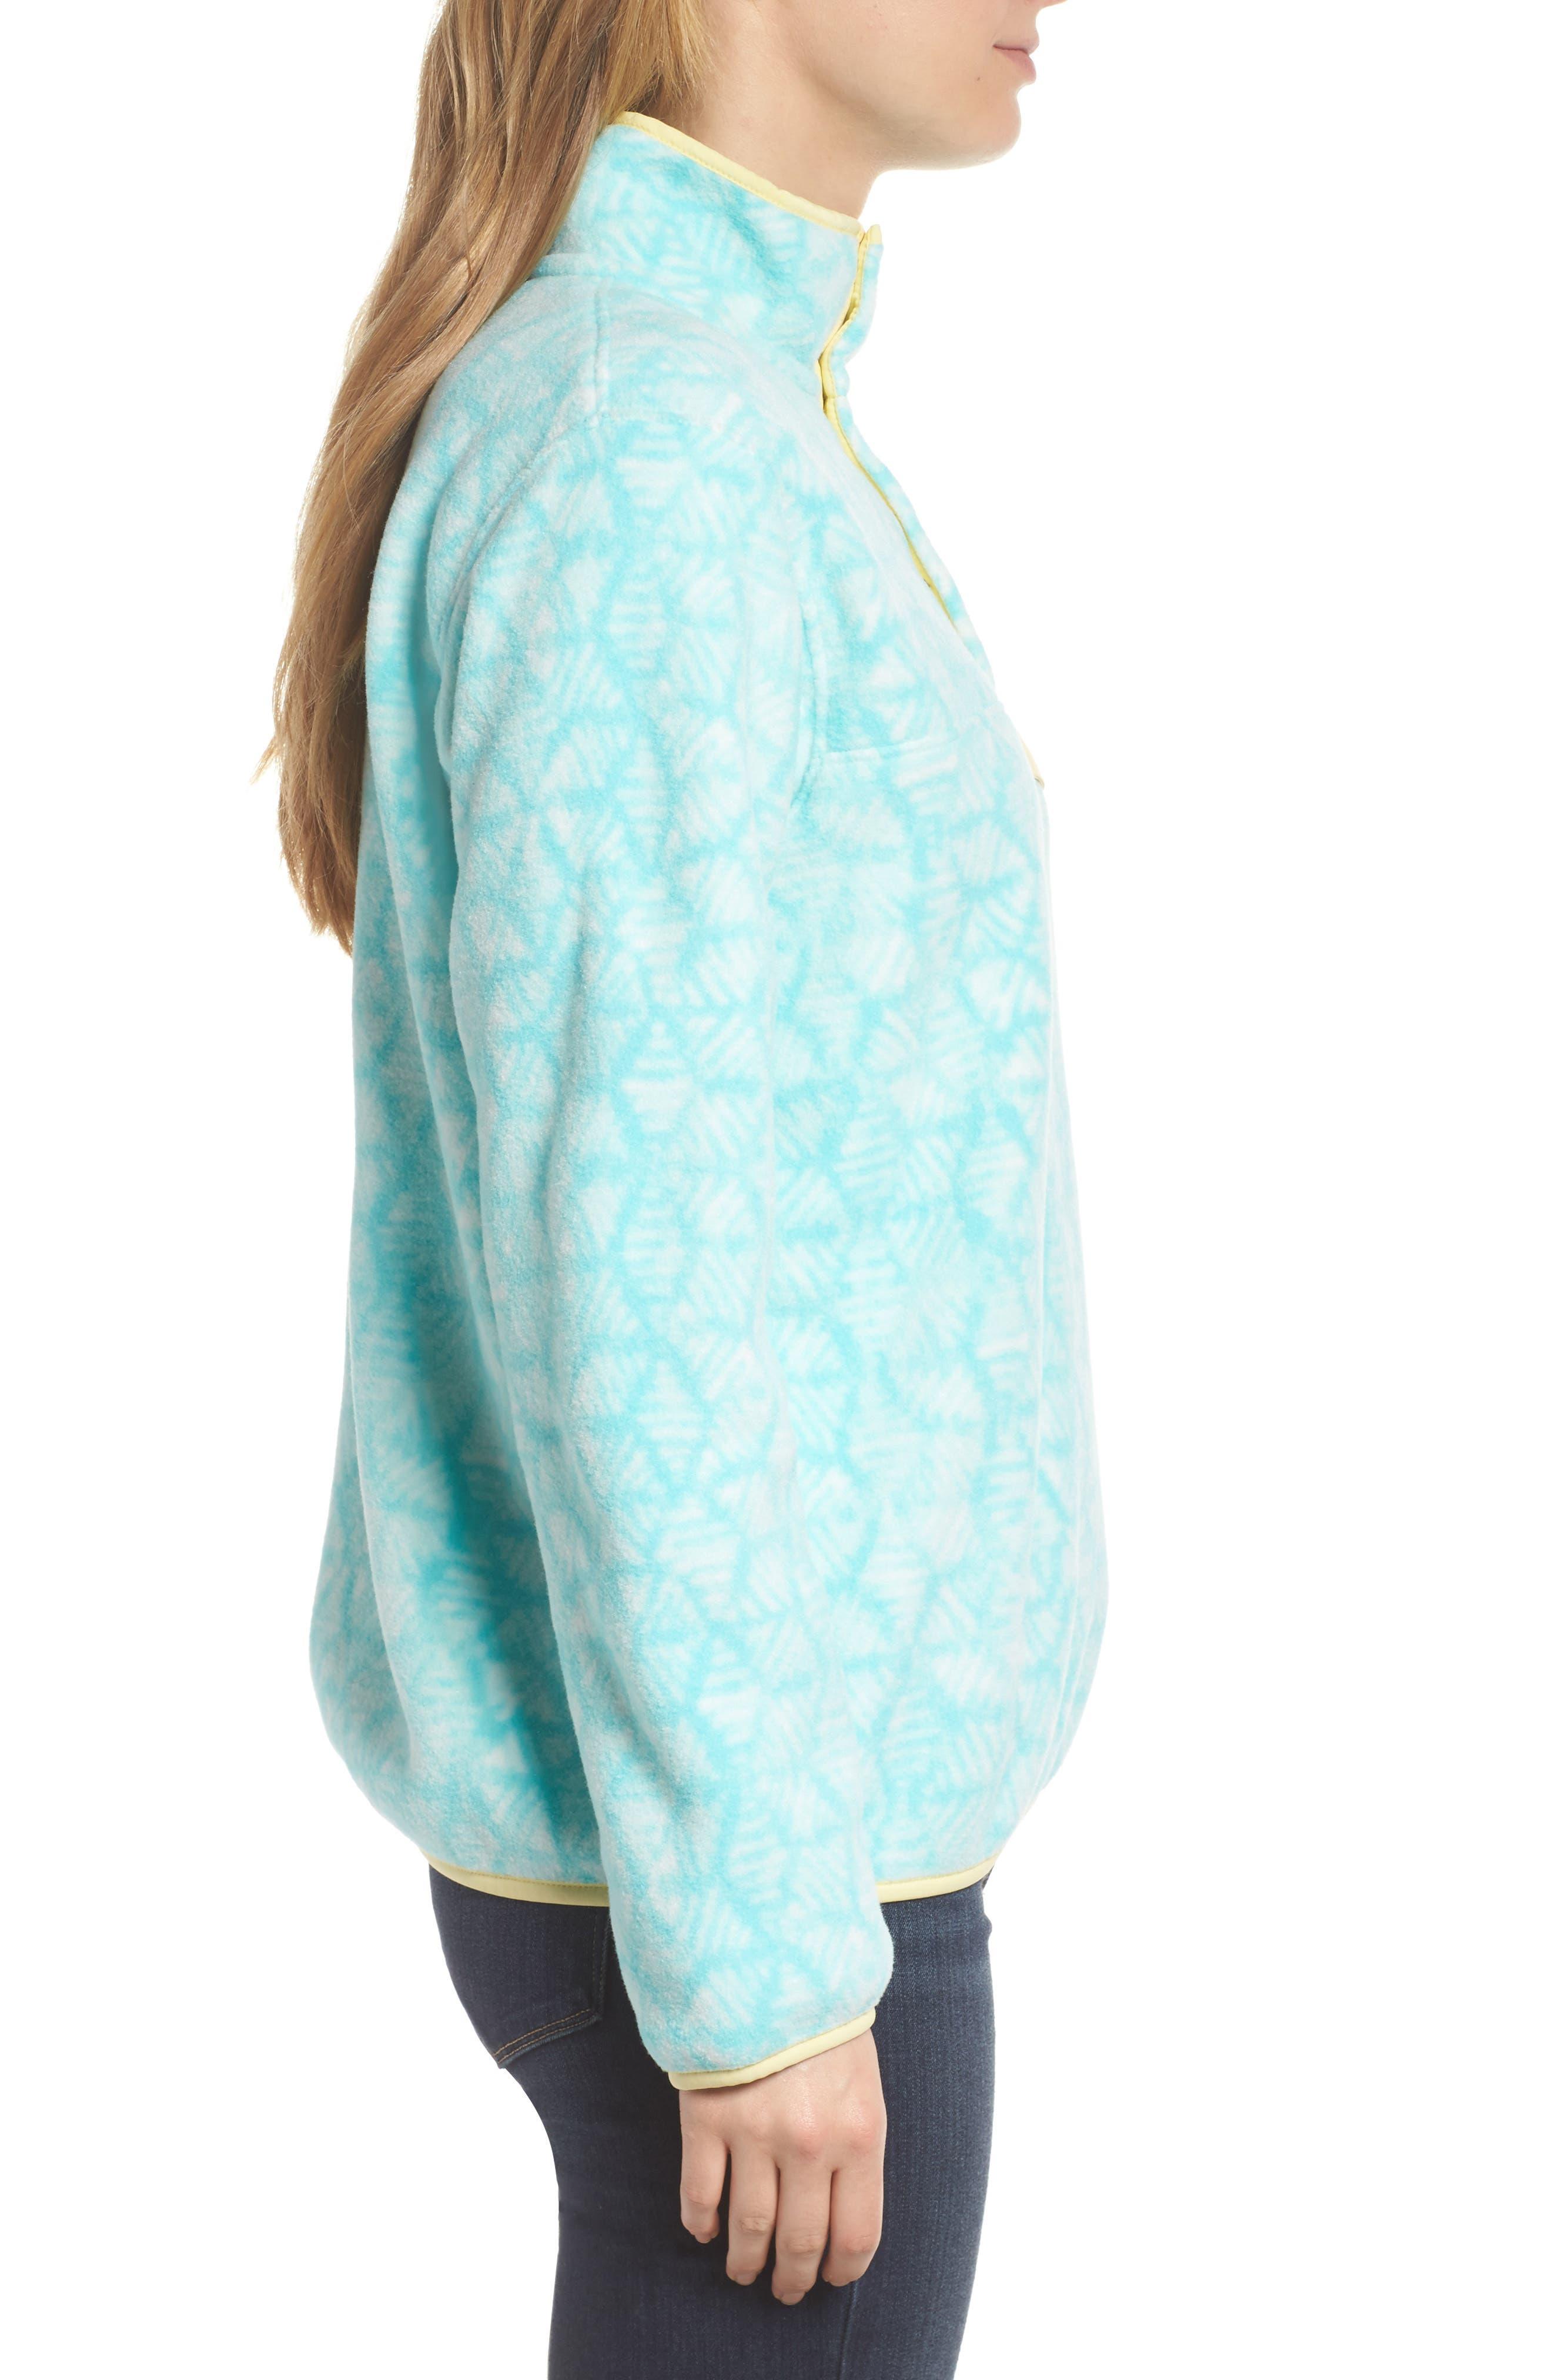 Synchilla Snap-T<sup>®</sup> Fleece Pullover,                             Alternate thumbnail 3, color,                             Batik Hex Big/ Bend Blue